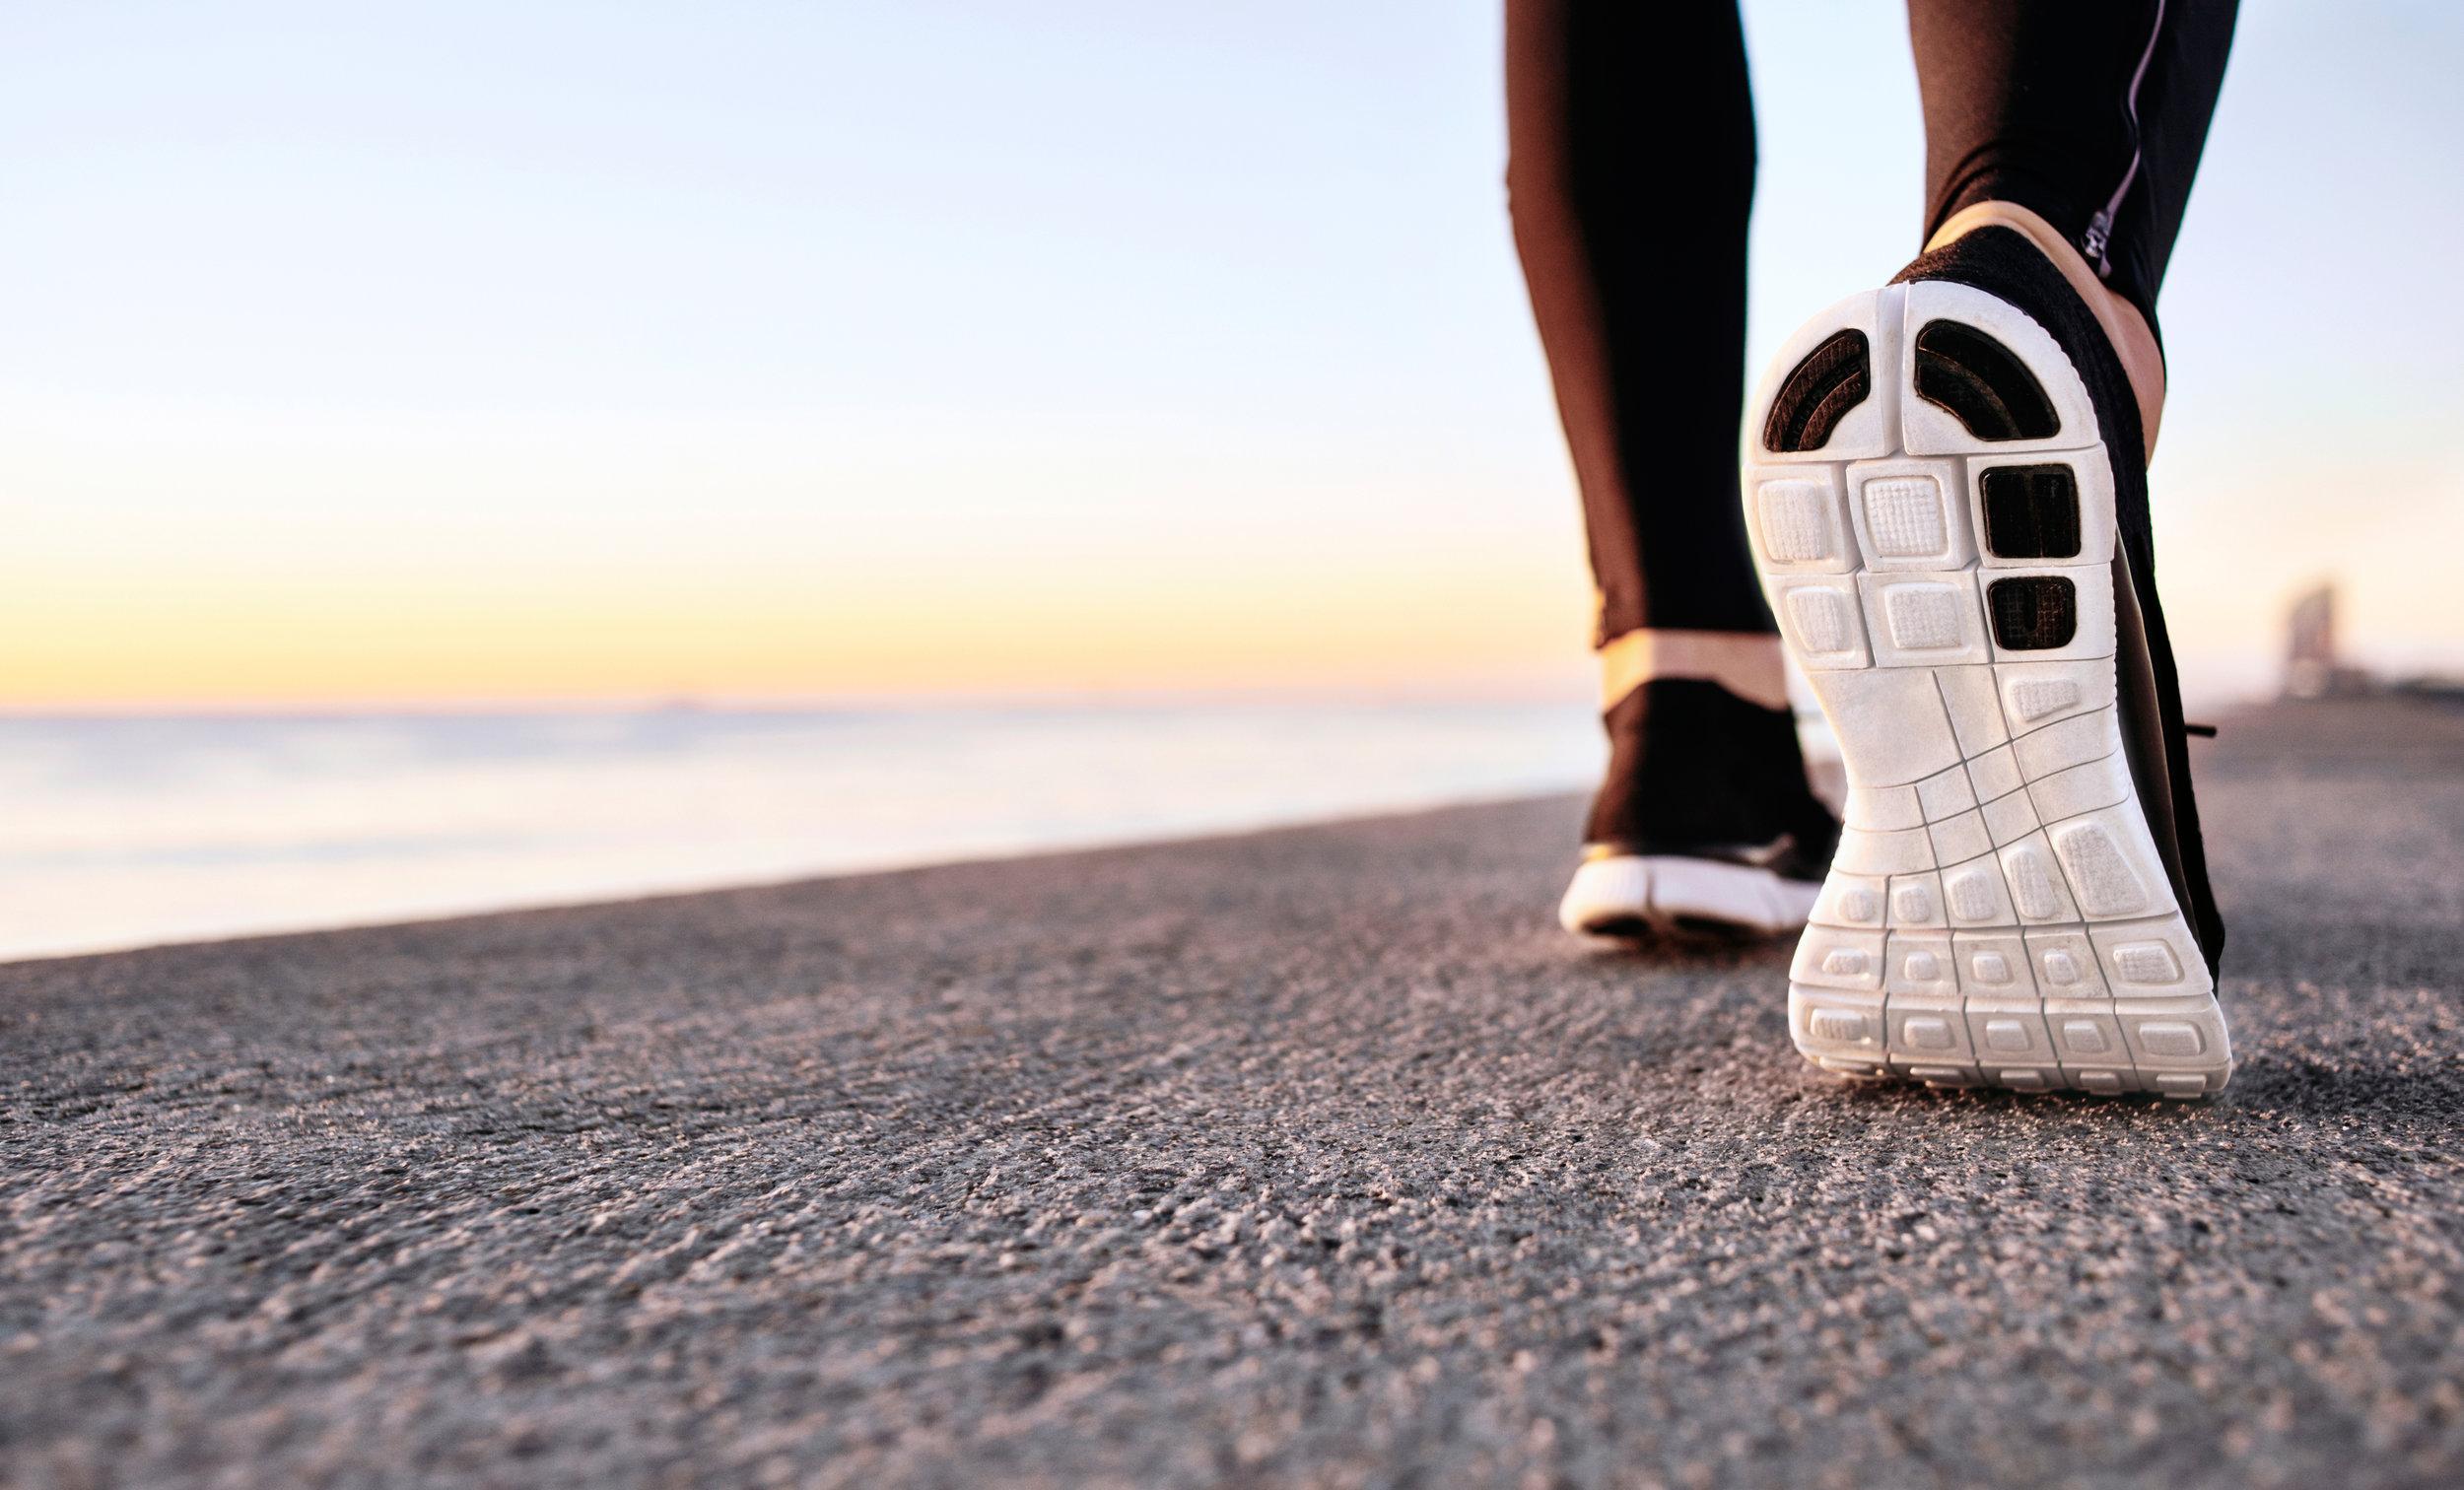 bigstock-Athlete-Runner-Feet-Running-On-116885579 copy.jpg